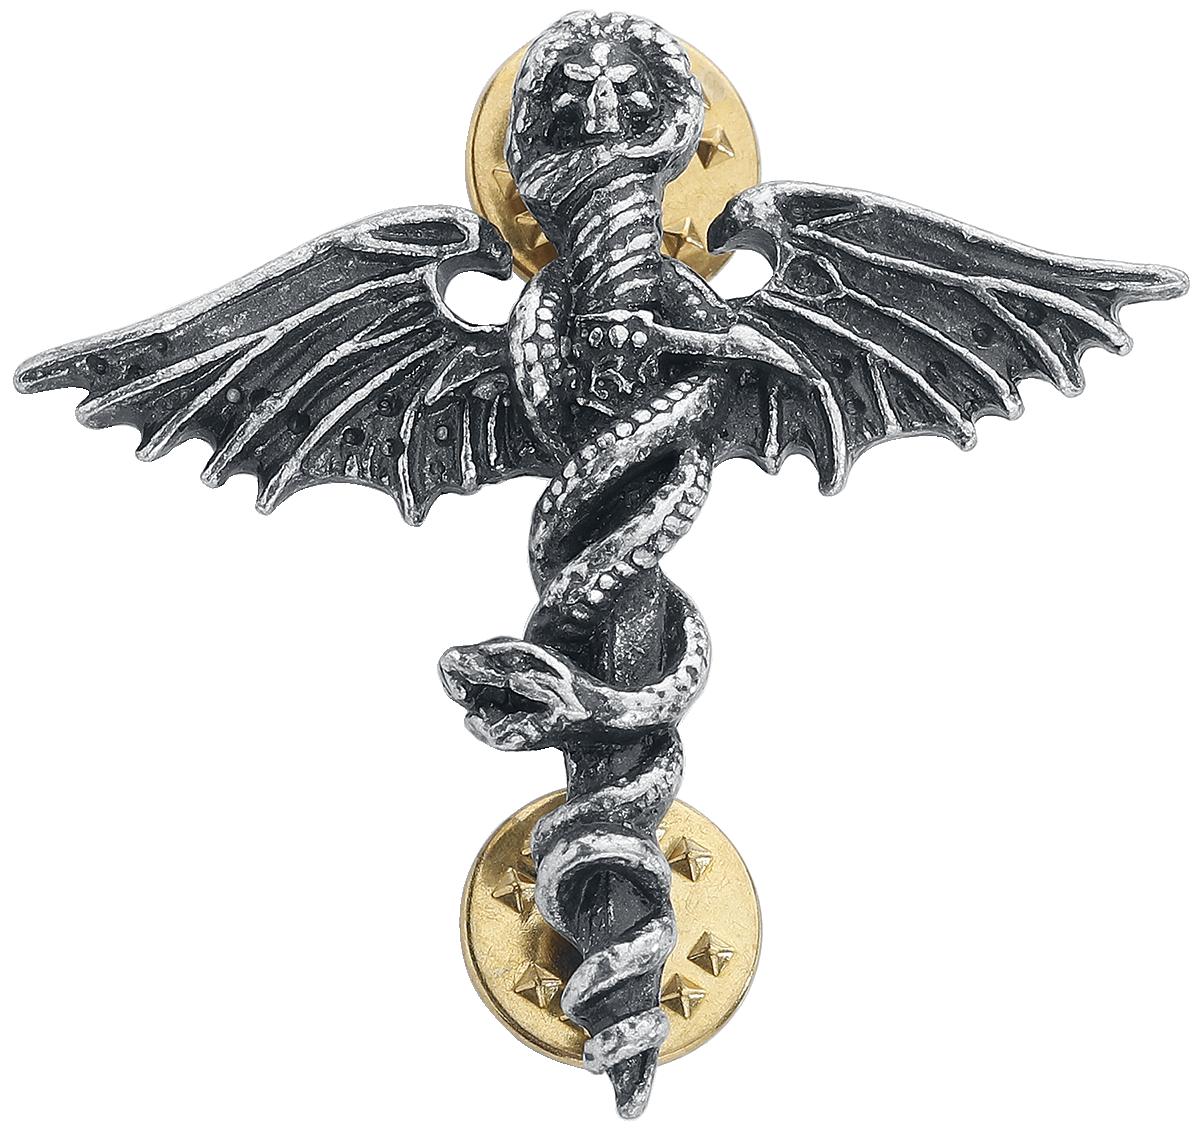 Mötley Crüe - Dr. Feelgood - Pin - silberfarben